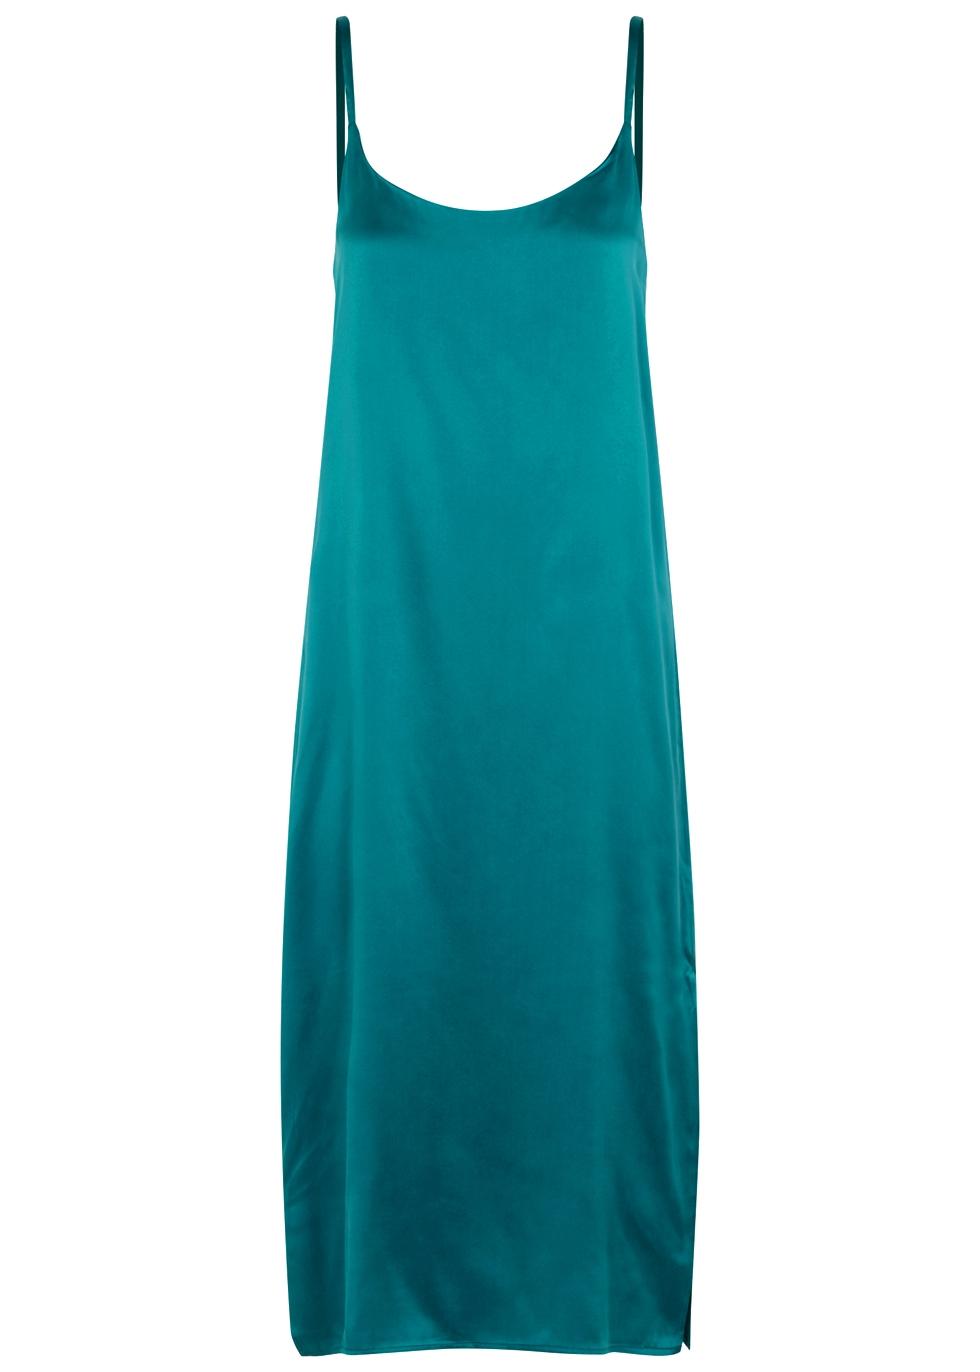 Turquoise Silk Dress, Teal